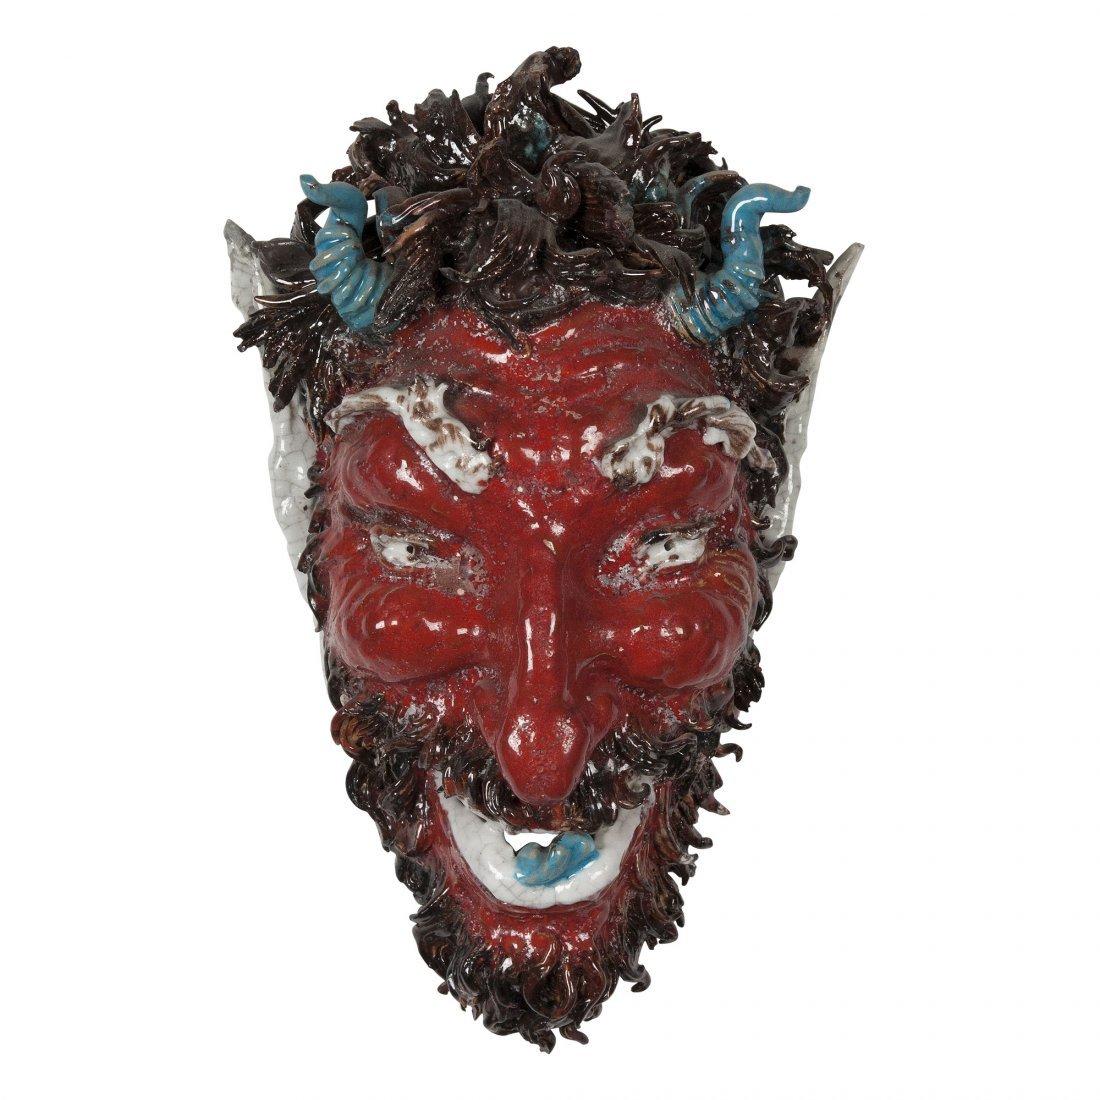 Devil Mask by Pattarino